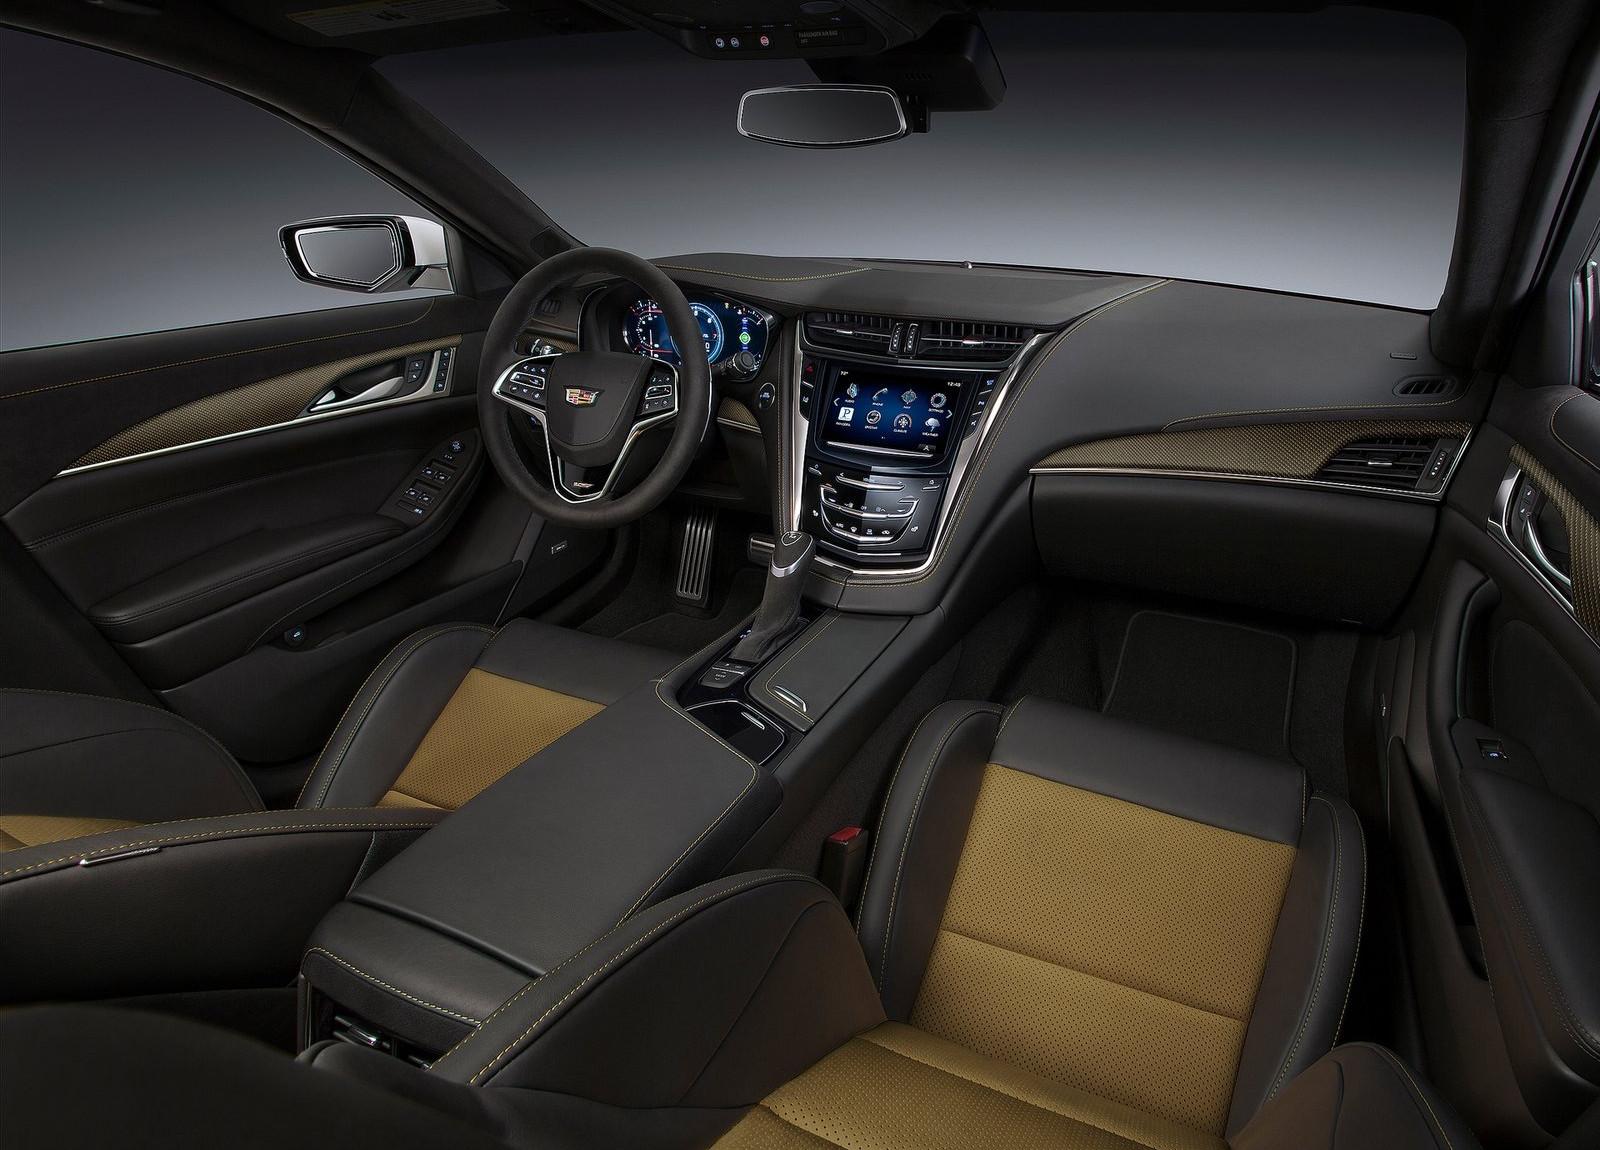 Cadillac-CTS-V_2016_1600x1200_wallpaper_0c